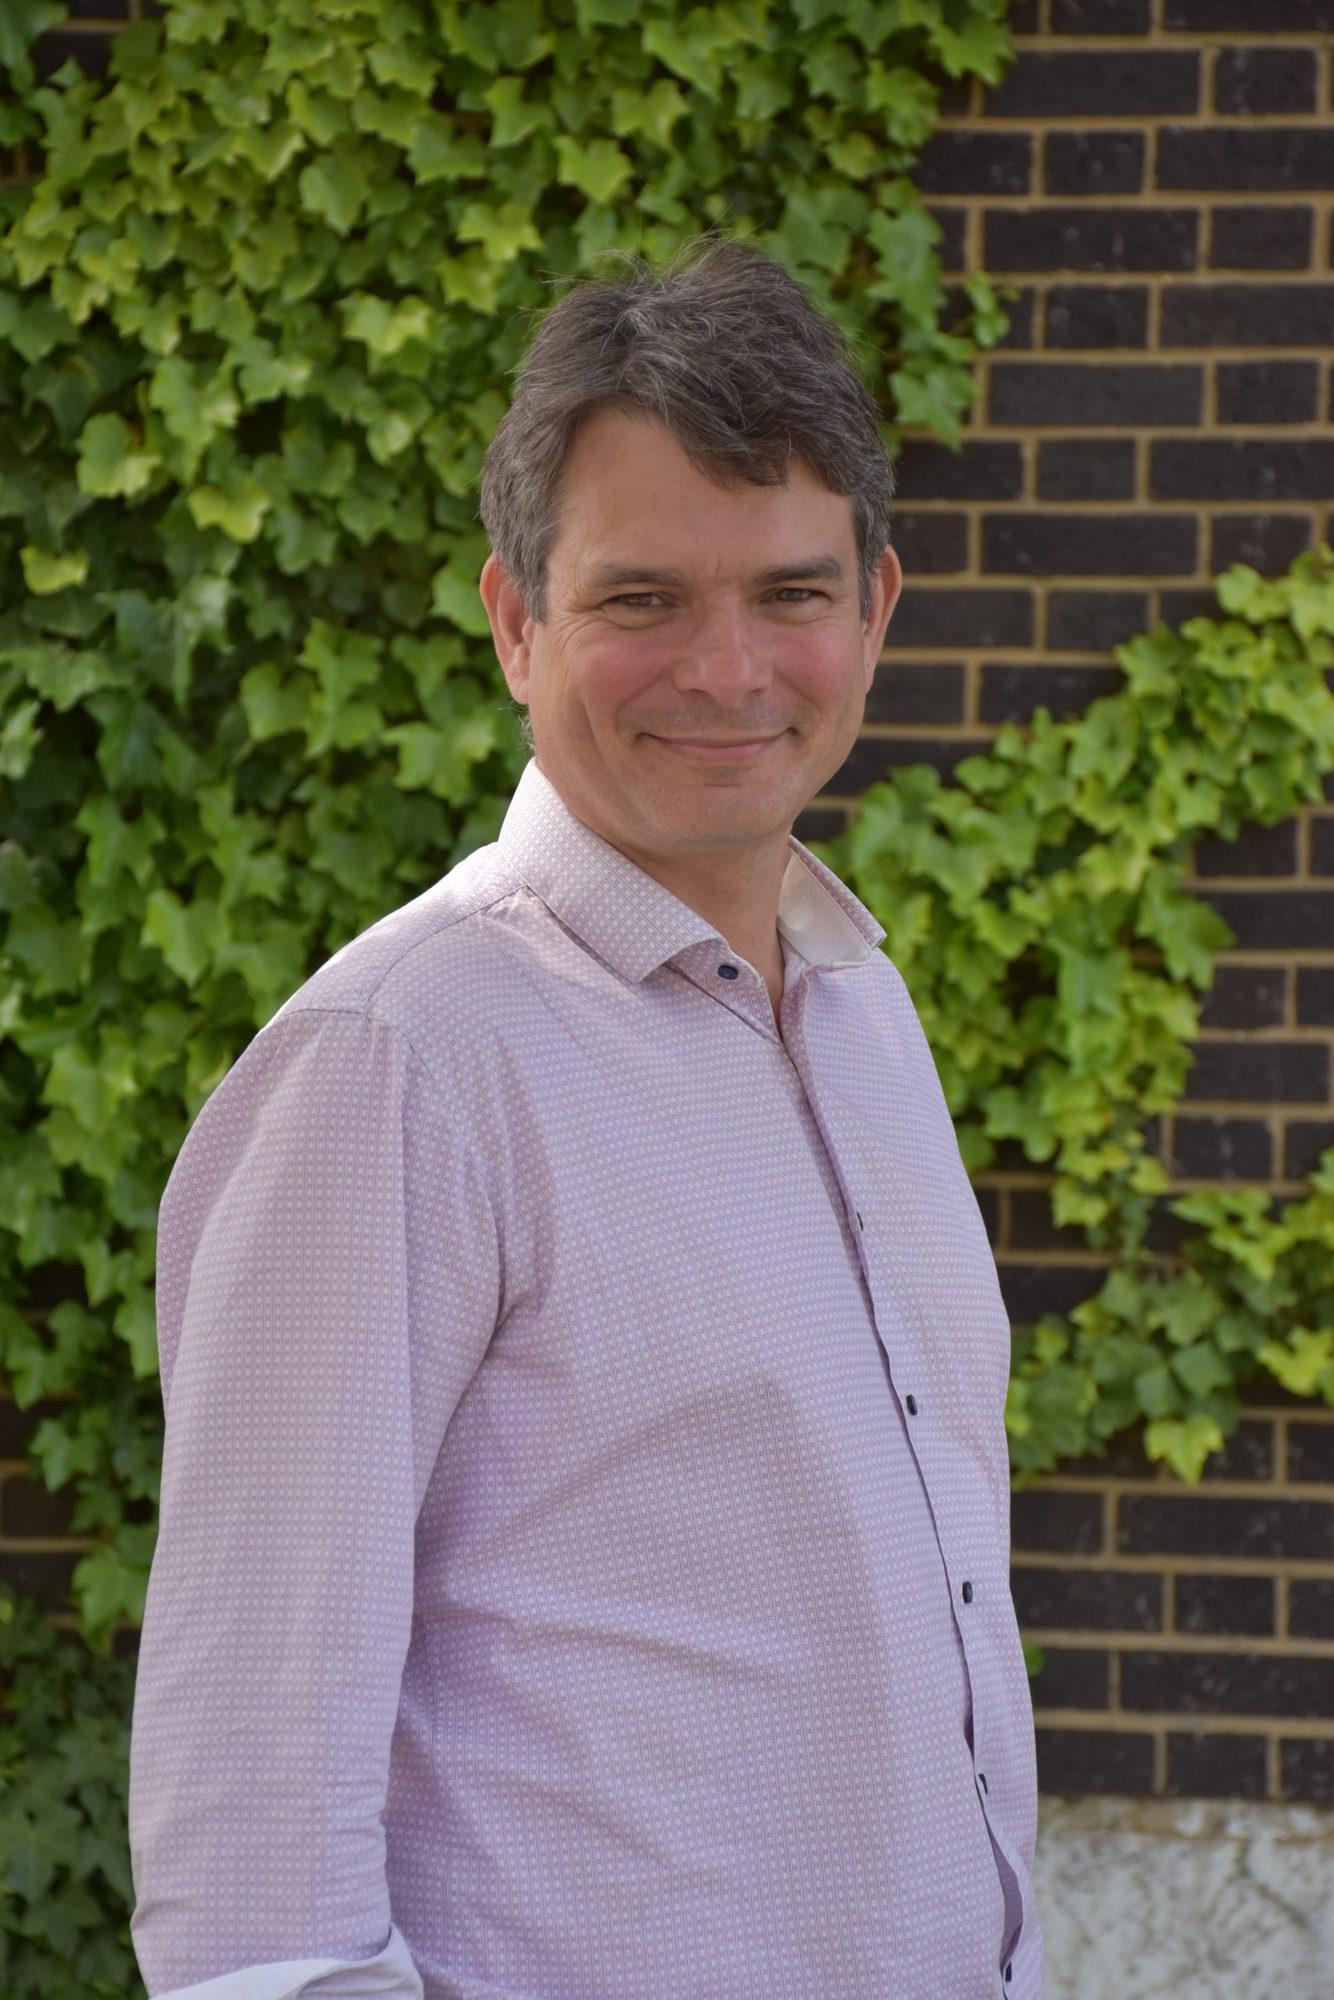 Giles Kerkham – Chair of Audit Committee